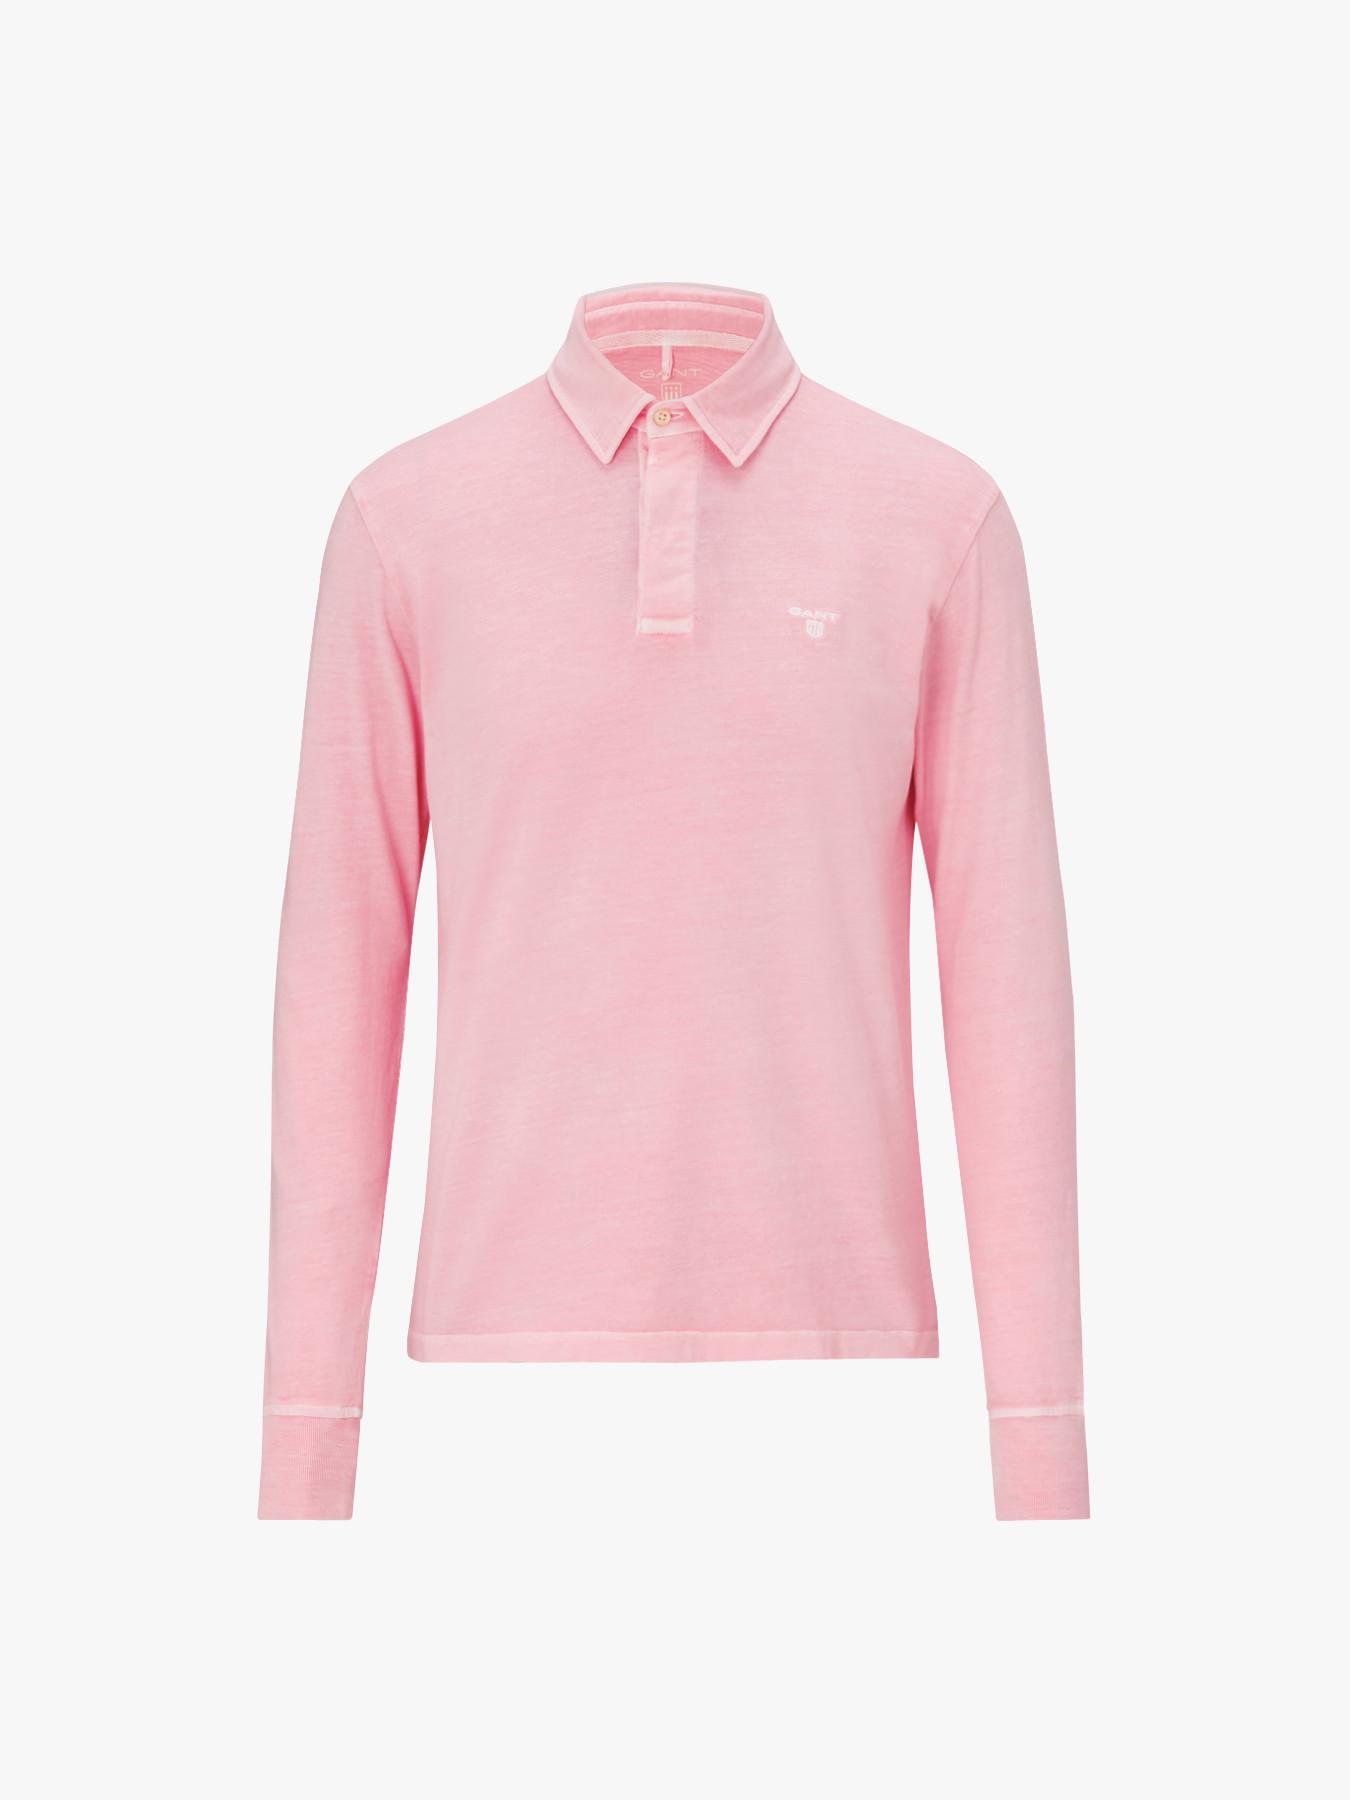 2d6a9625d33 GANT Sunbleached Rugger Polo Shirt   Polo Shirt   Fenwick